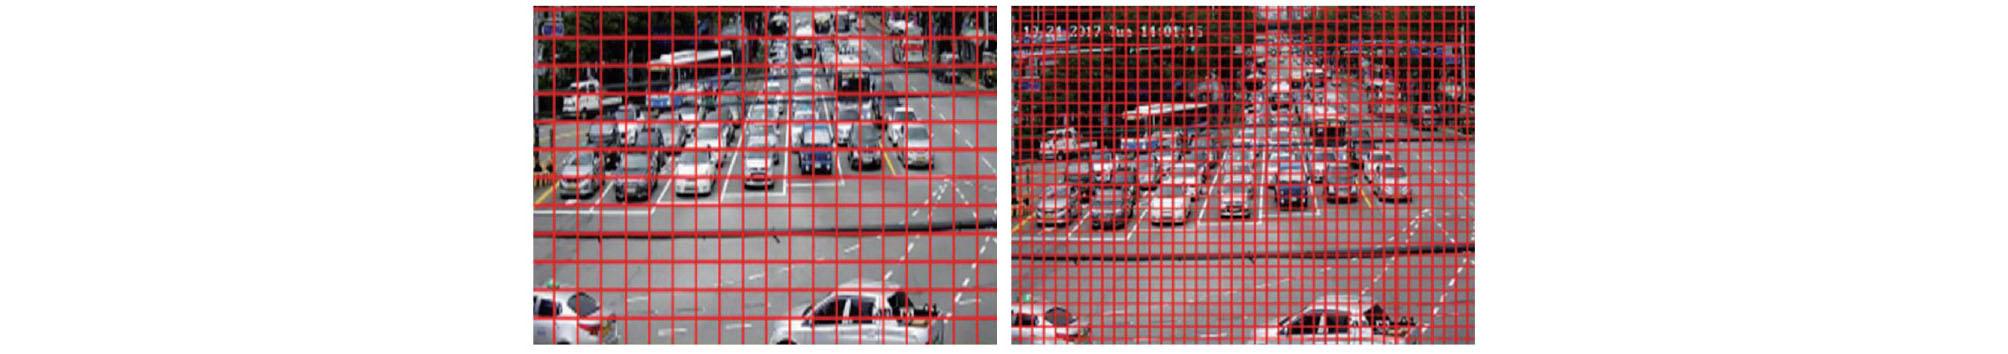 http://static.apub.kr/journalsite/sites/ksce/2020-040-01/N0110400107/images/Figure_KSCE_40_01_07_F5.jpg